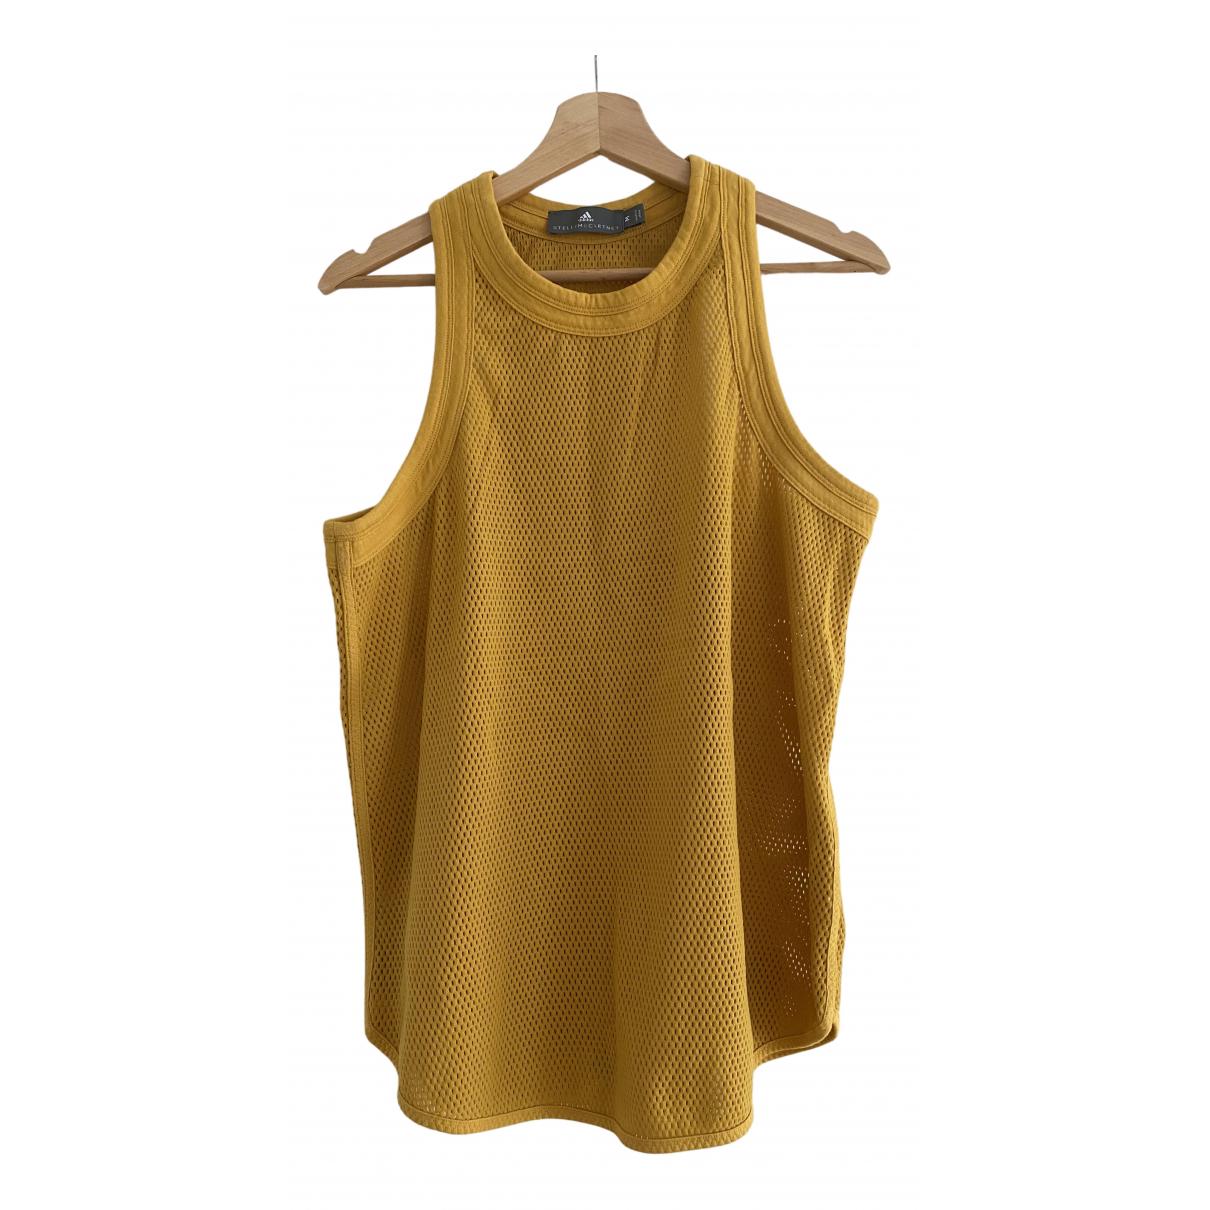 Stella Mccartney Pour Adidas \N Yellow  top for Women M International